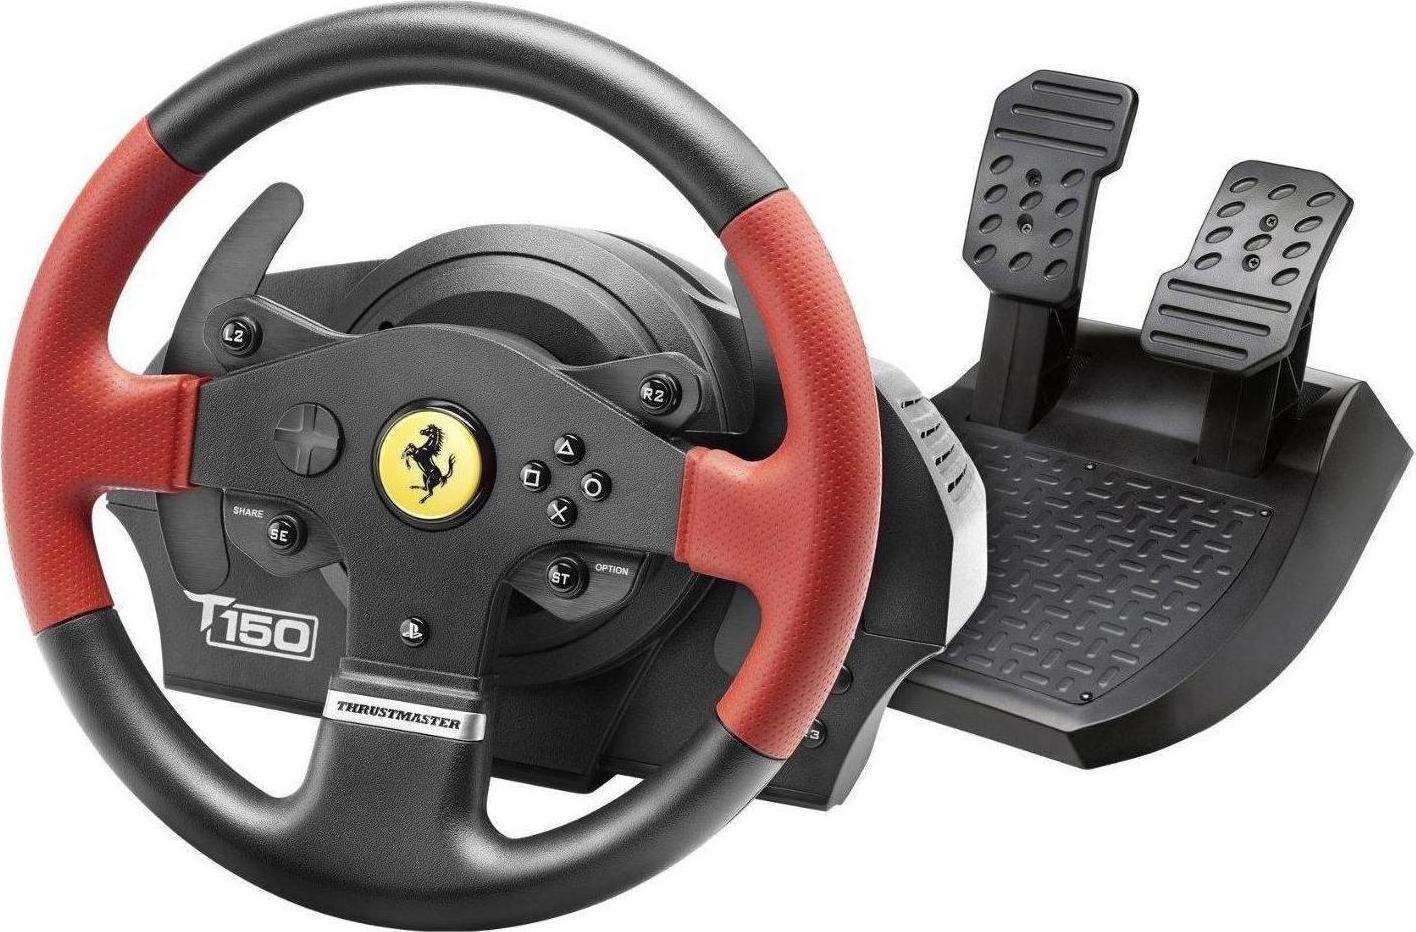 Thrustmaster T150 Ferrari Wheel Force Feedback Τιμονιέρα